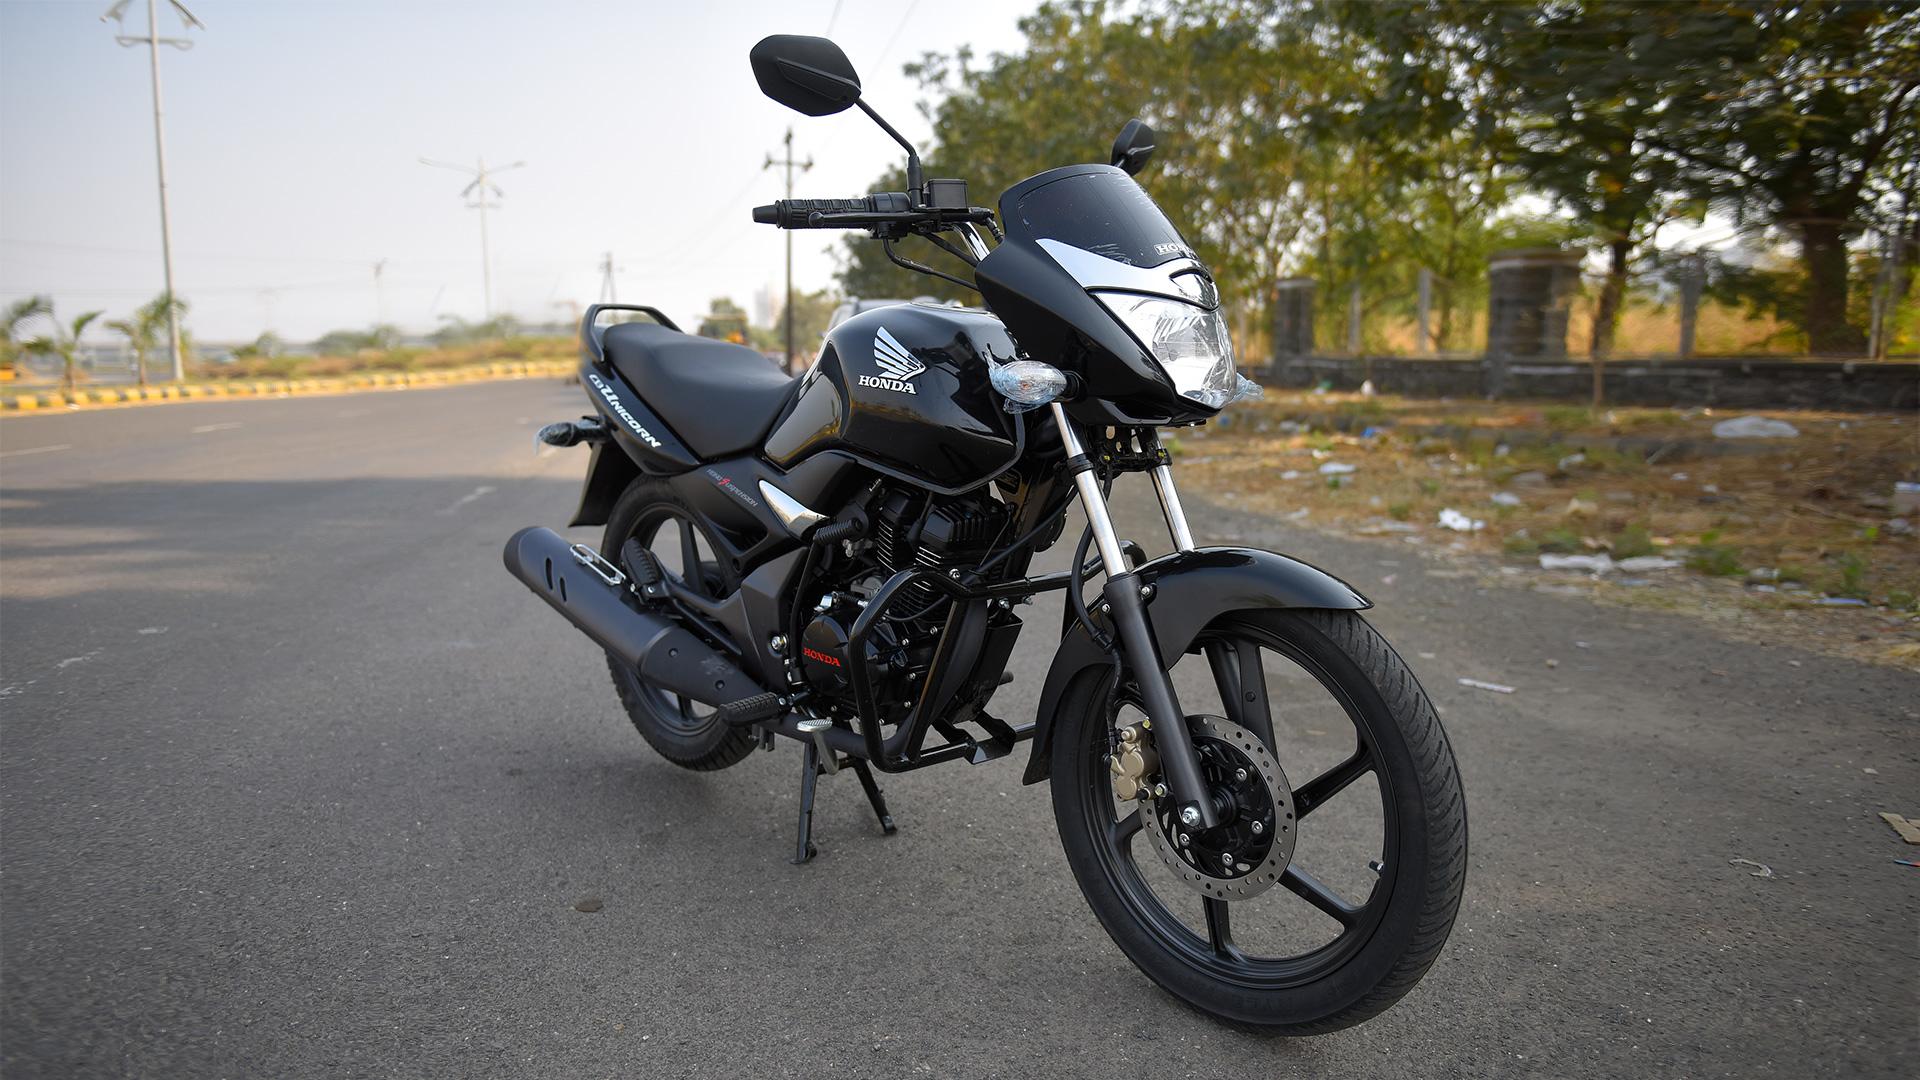 honda cb unicorn 150 2019 - price  mileage  reviews  specification  gallery